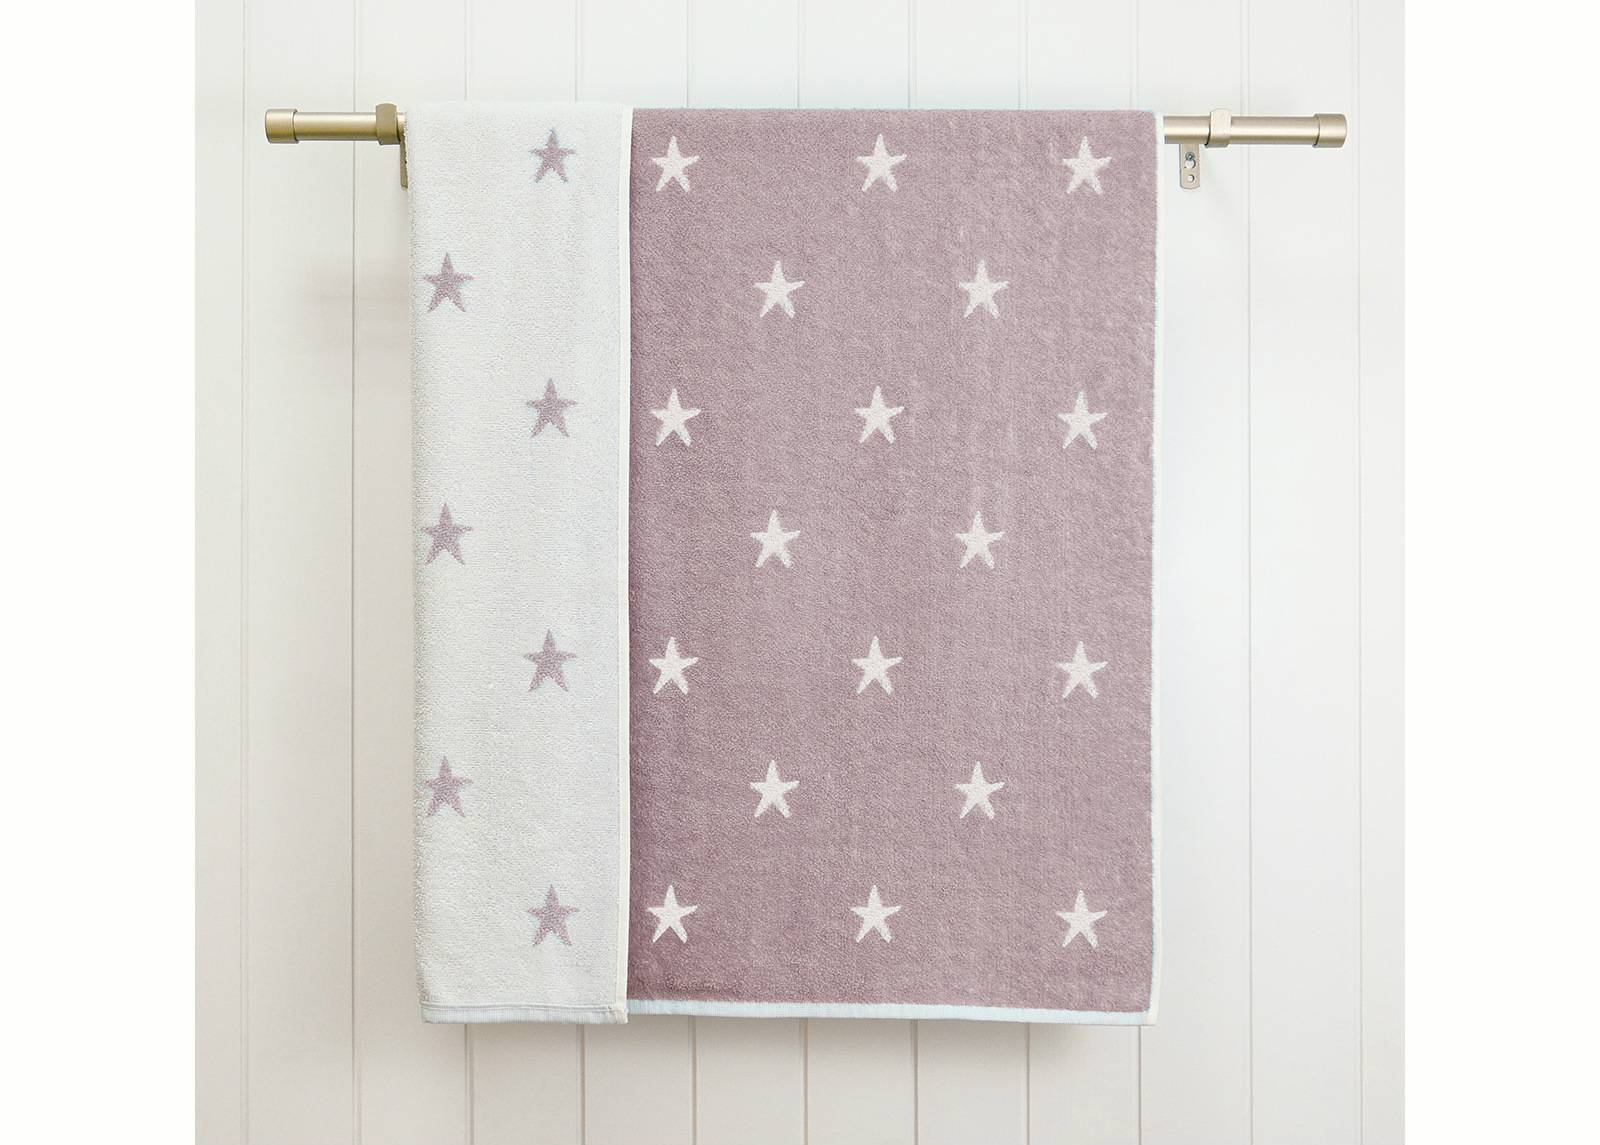 ARDENZA BABY Froteepyyhe Stars 70x120 cm, violetti